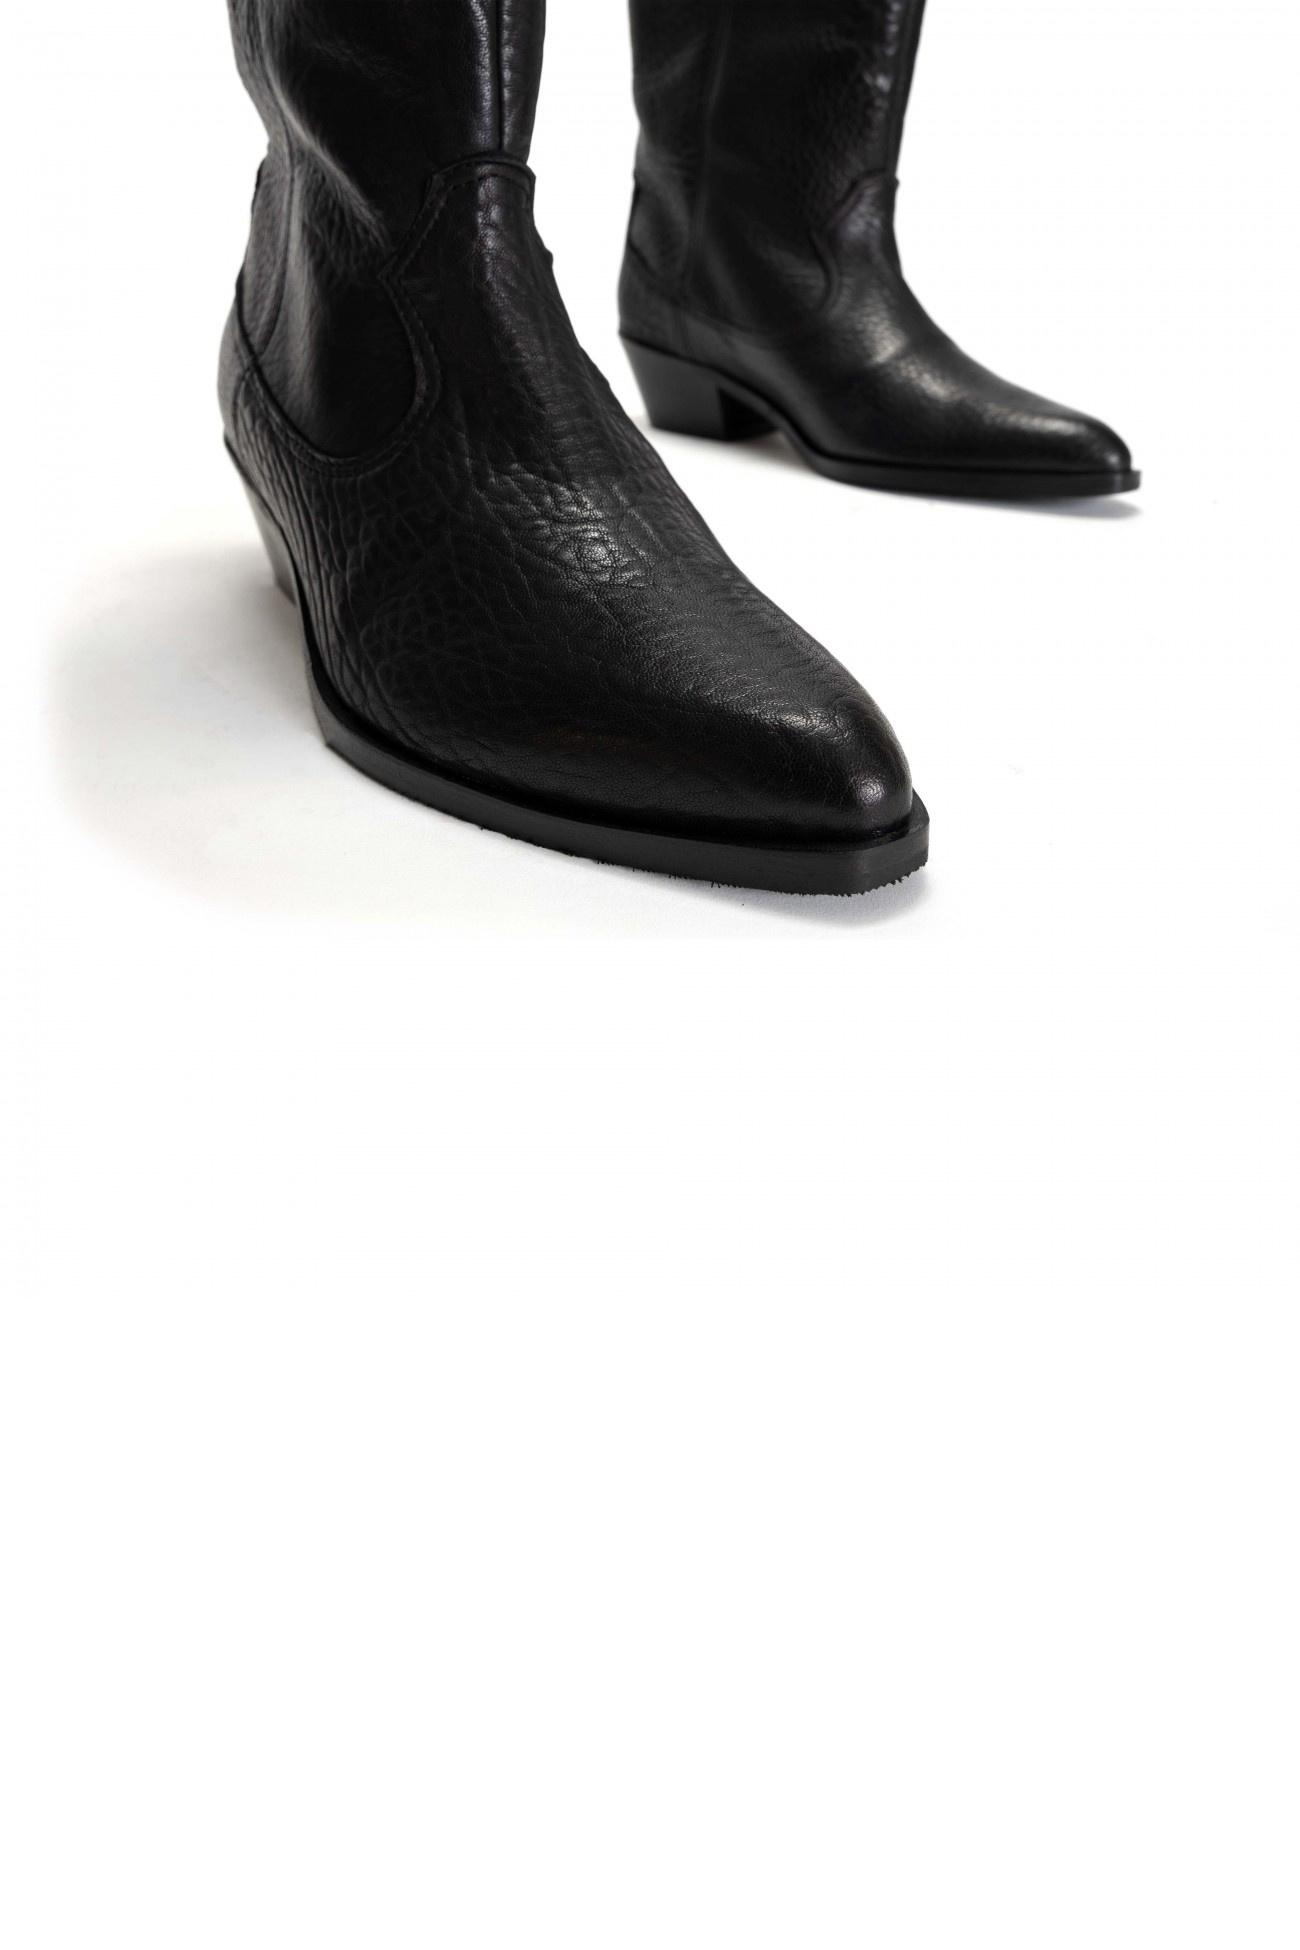 Saseline 35 Heavy Grain Calf Boot - Black-4